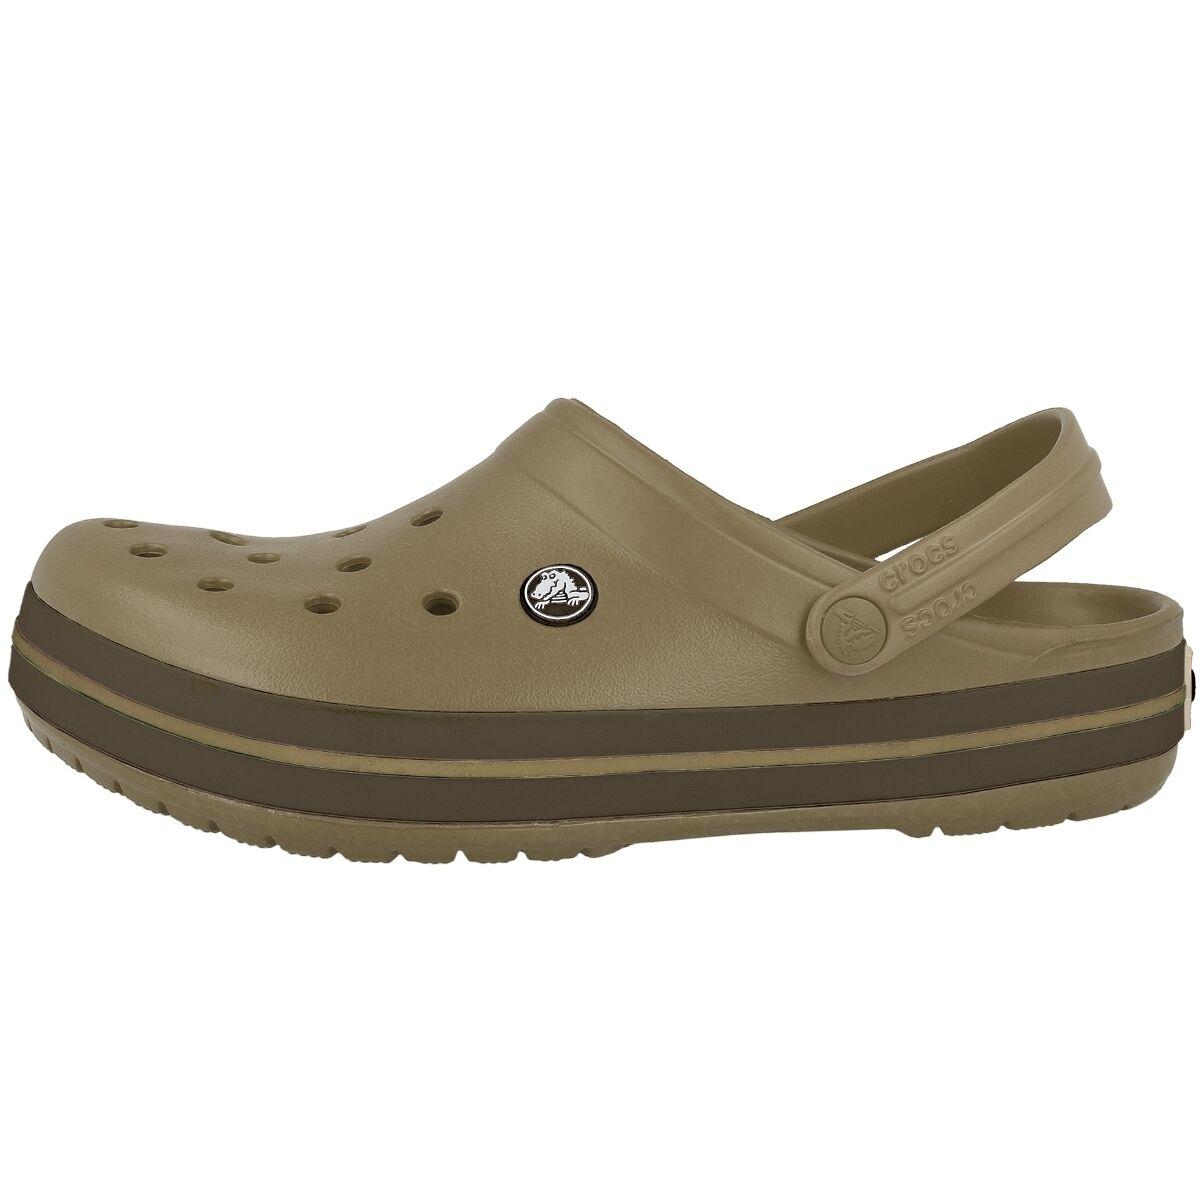 Crocs  Crocband Sabot  Crocs  kaki 11016-23g Chaussures tongs de piscine 2.5 07c3cf